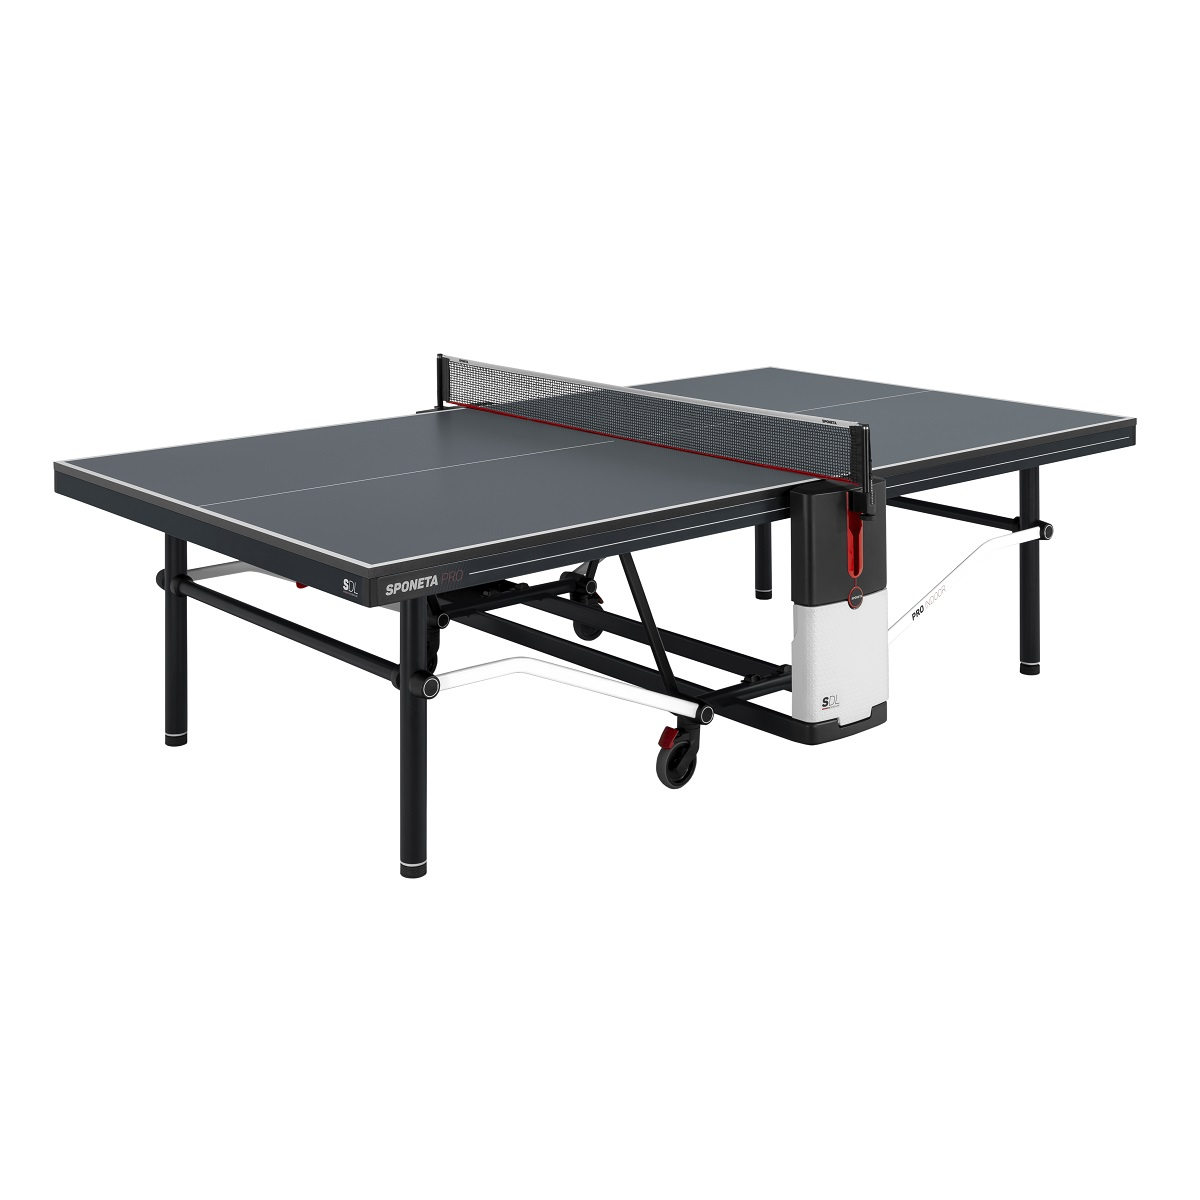 Stôl na stolný tenis SPONETA Design Line - Pro Indoor - vnútorný